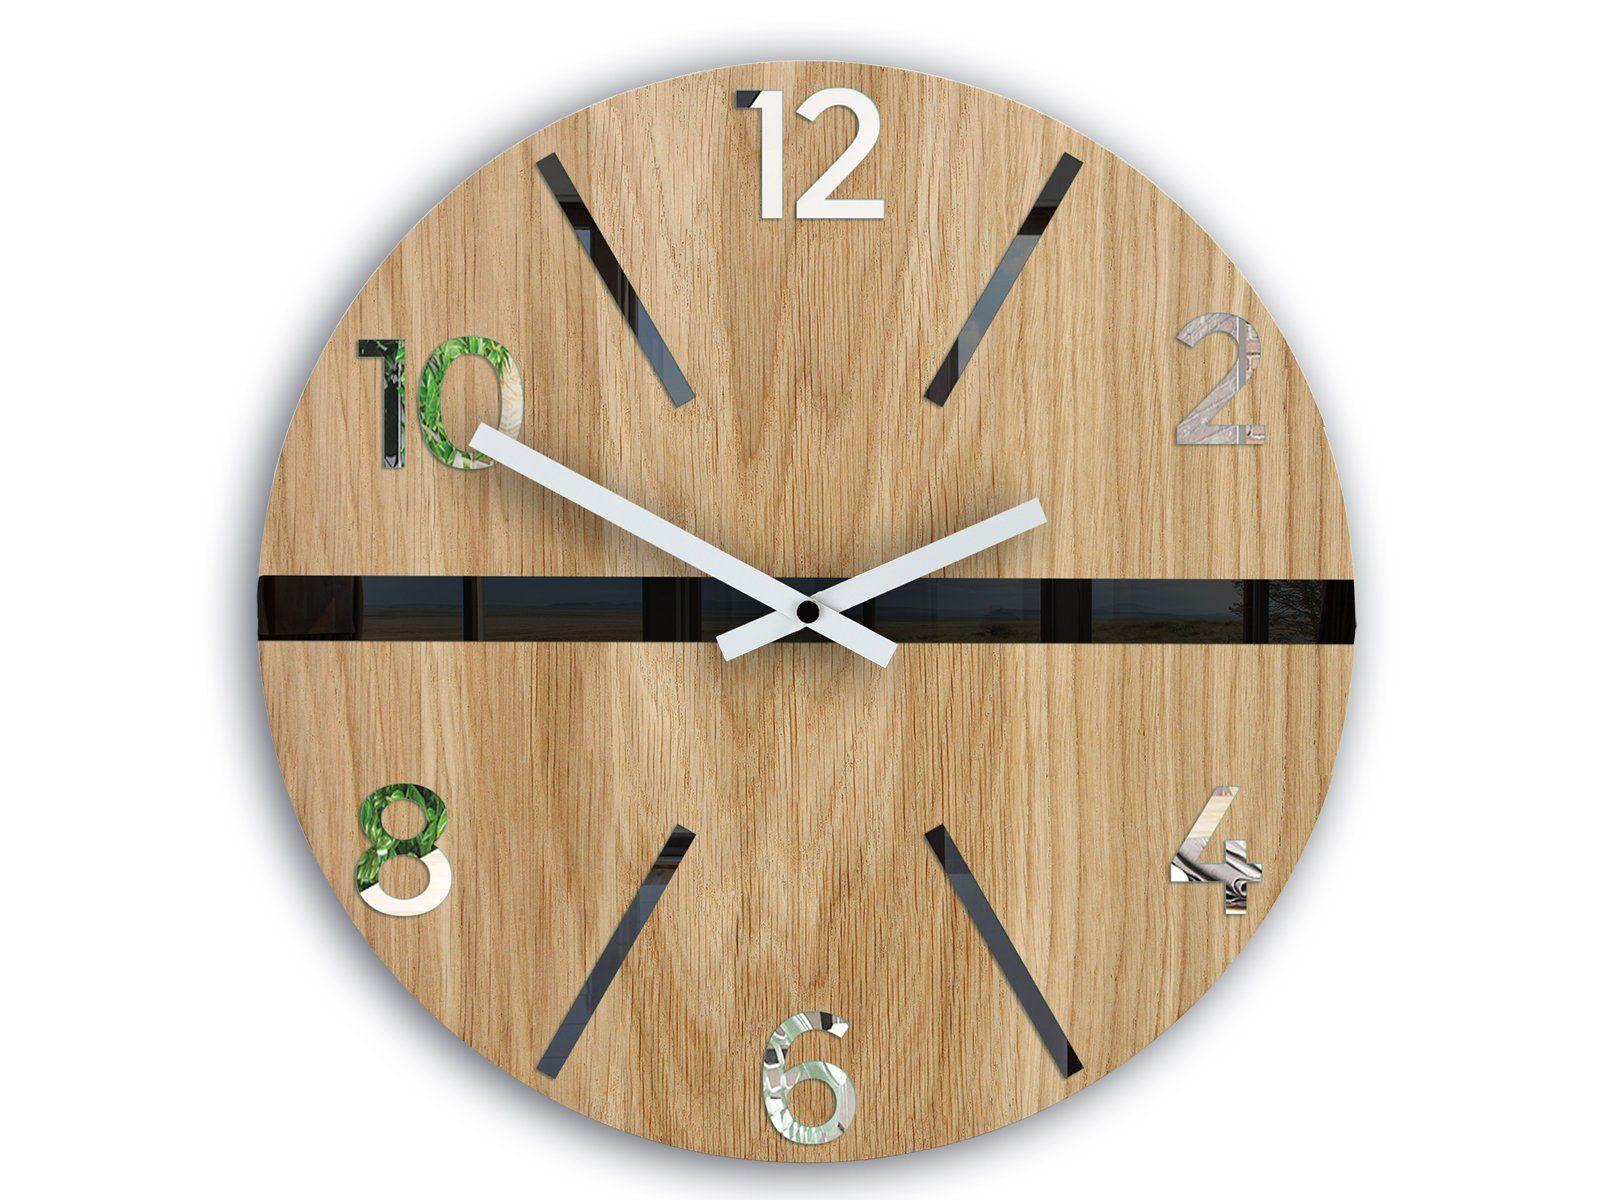 Wall Clock In Scandinavian Style White Black And Mirror Etsy Wall Clock Clock Colorful Wall Clocks